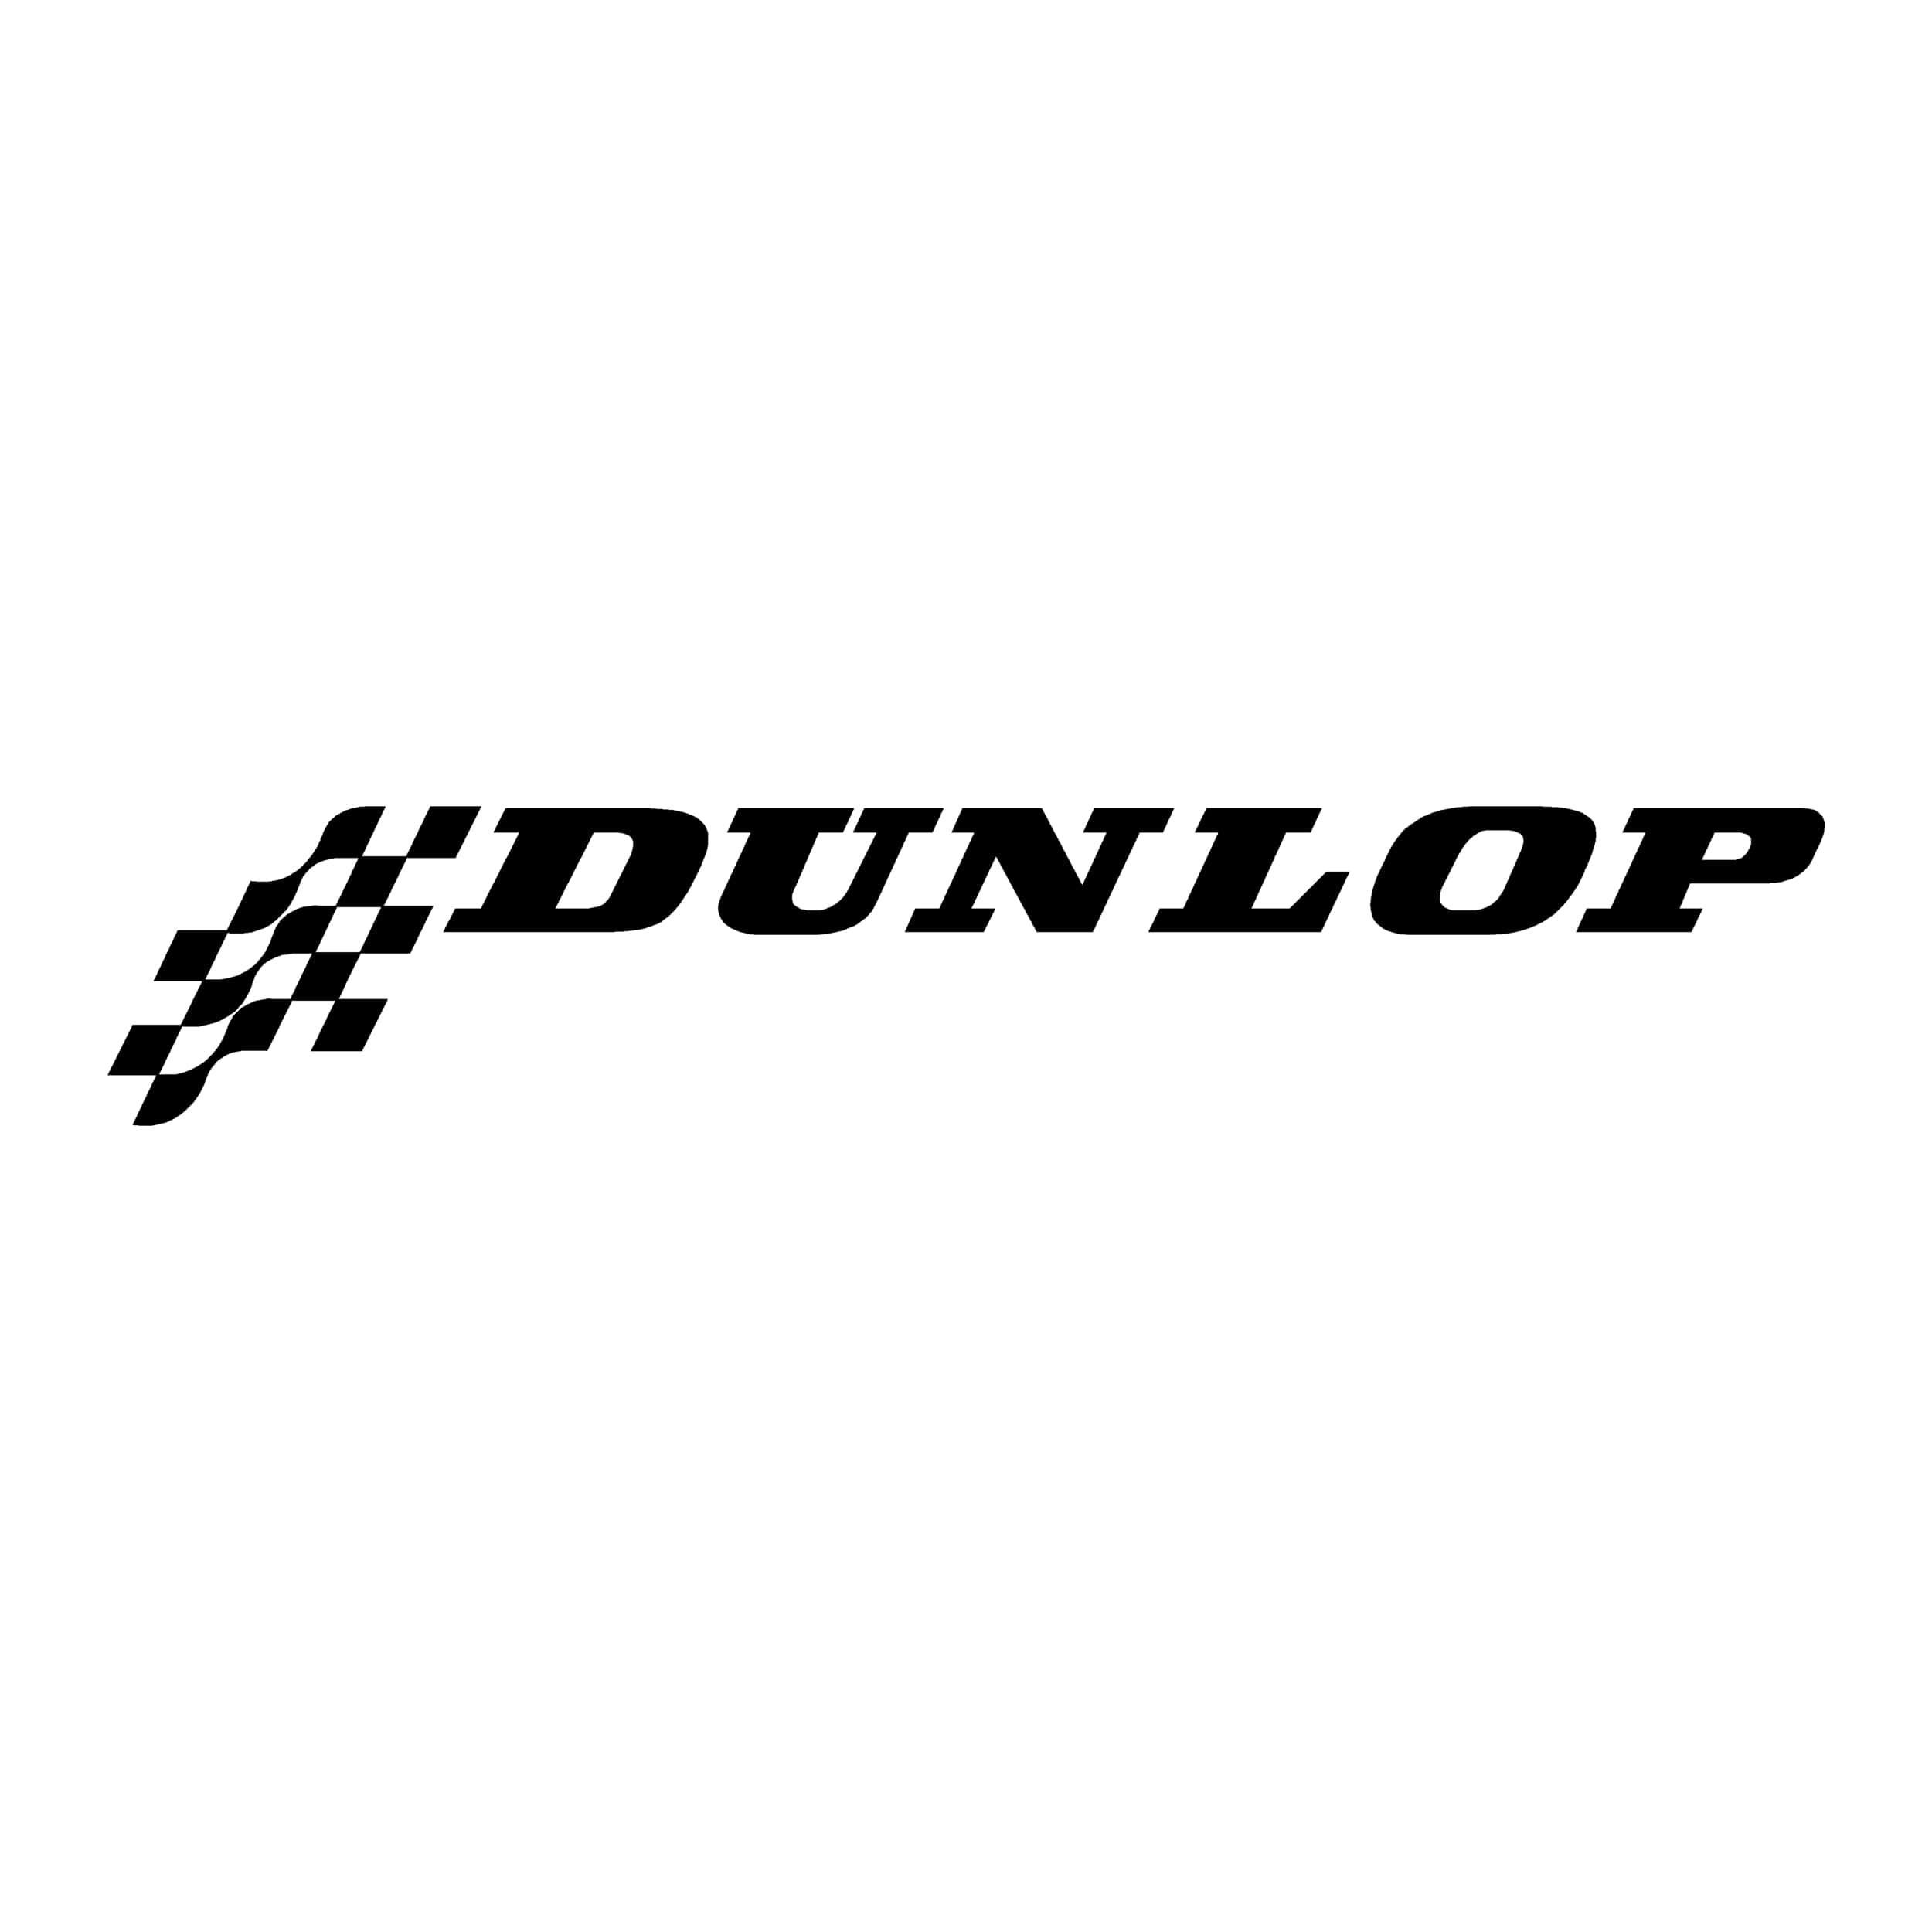 sticker-dunlop-ref-1-tuning-auto-moto-camion-competition-deco-rallye-autocollant-min